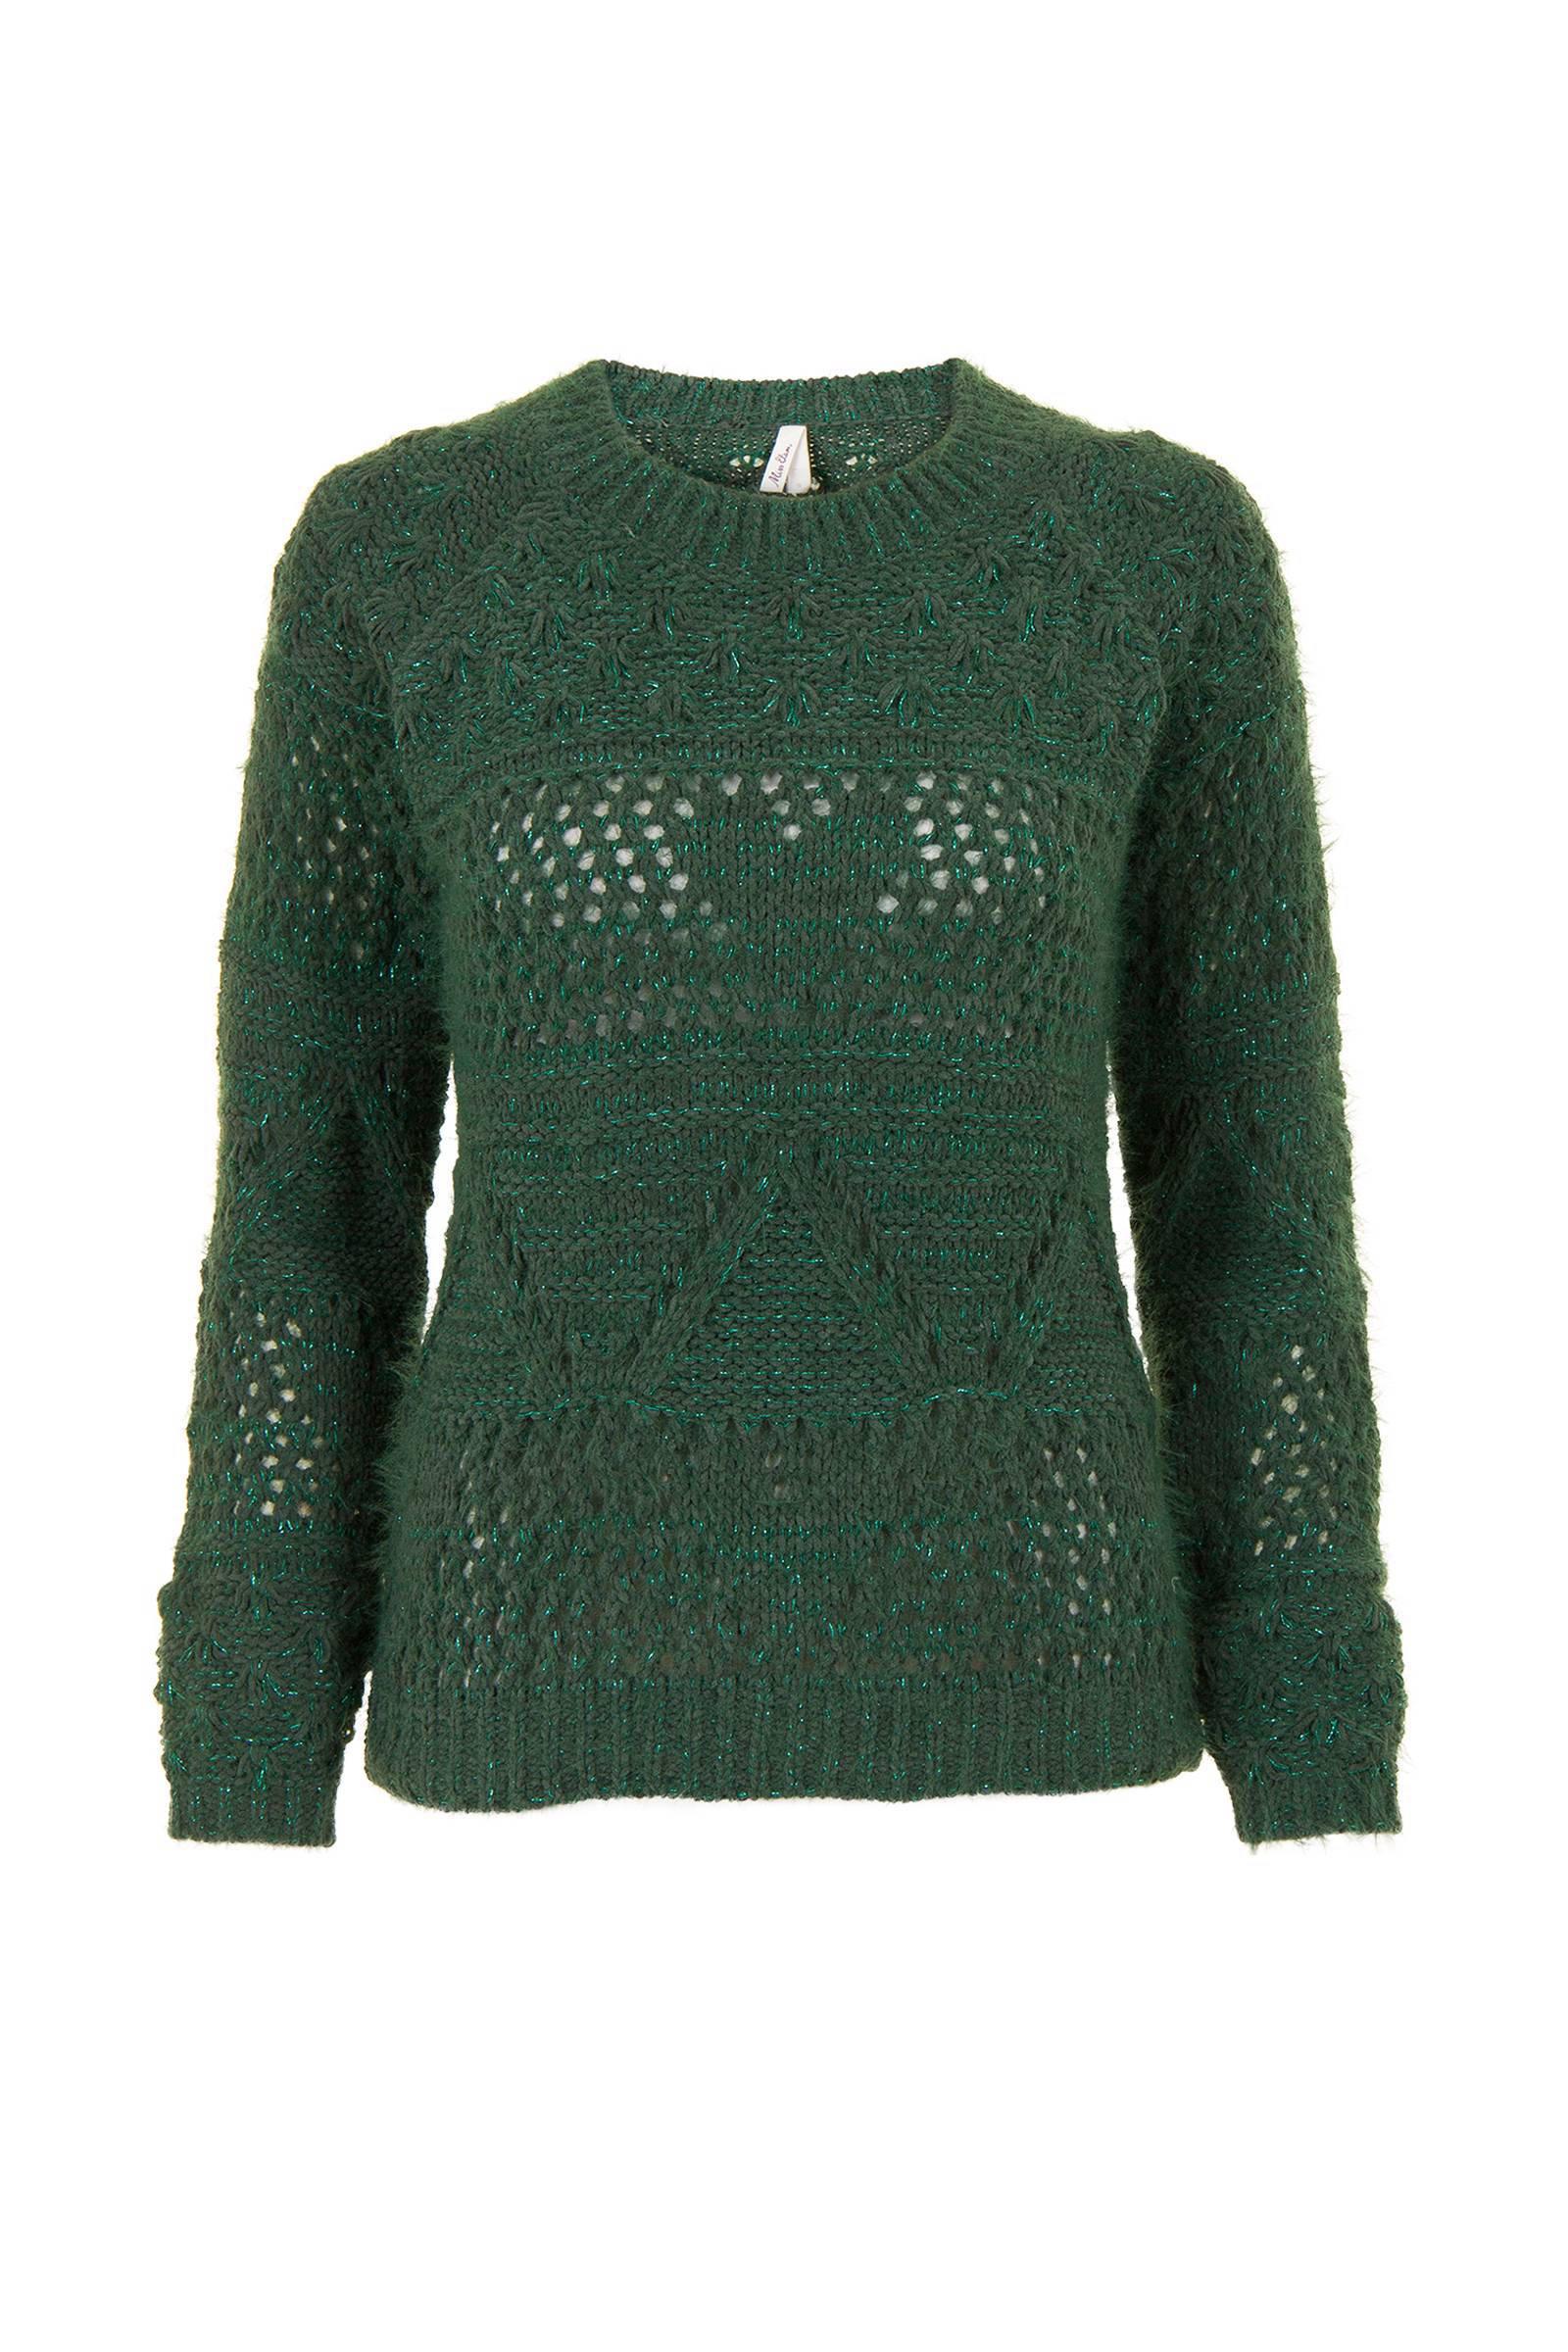 Miss Etam Regulier trui met opengewerkt patroon koraal | wehkamp